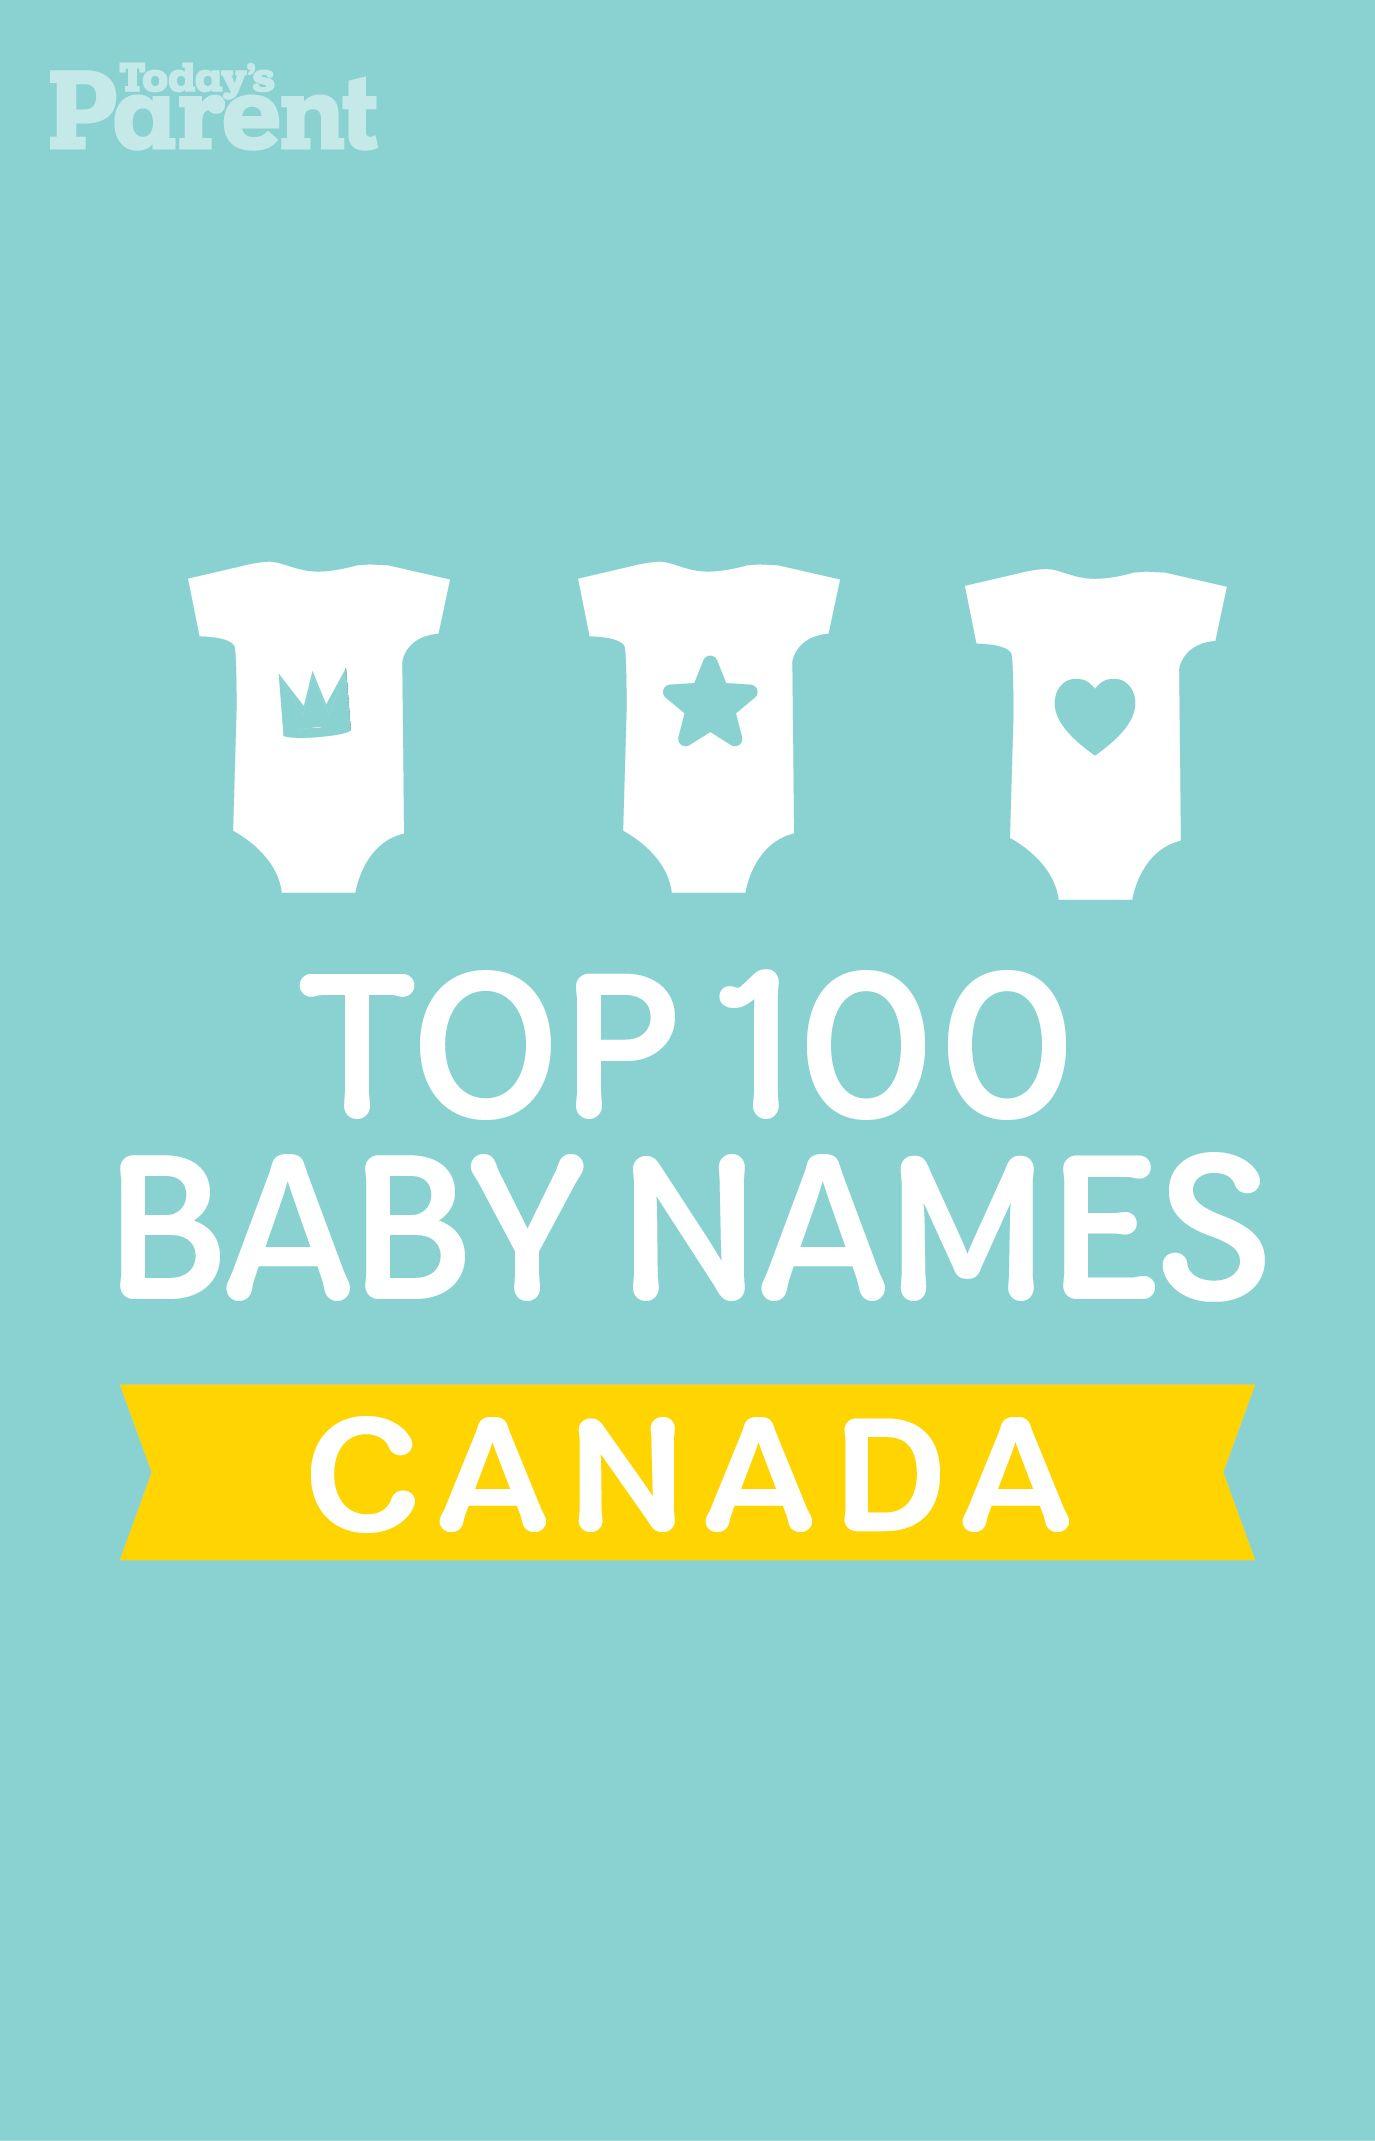 die besten 25 top 100 babynamen ideen auf pinterest beliebteste baby namen beliebte. Black Bedroom Furniture Sets. Home Design Ideas